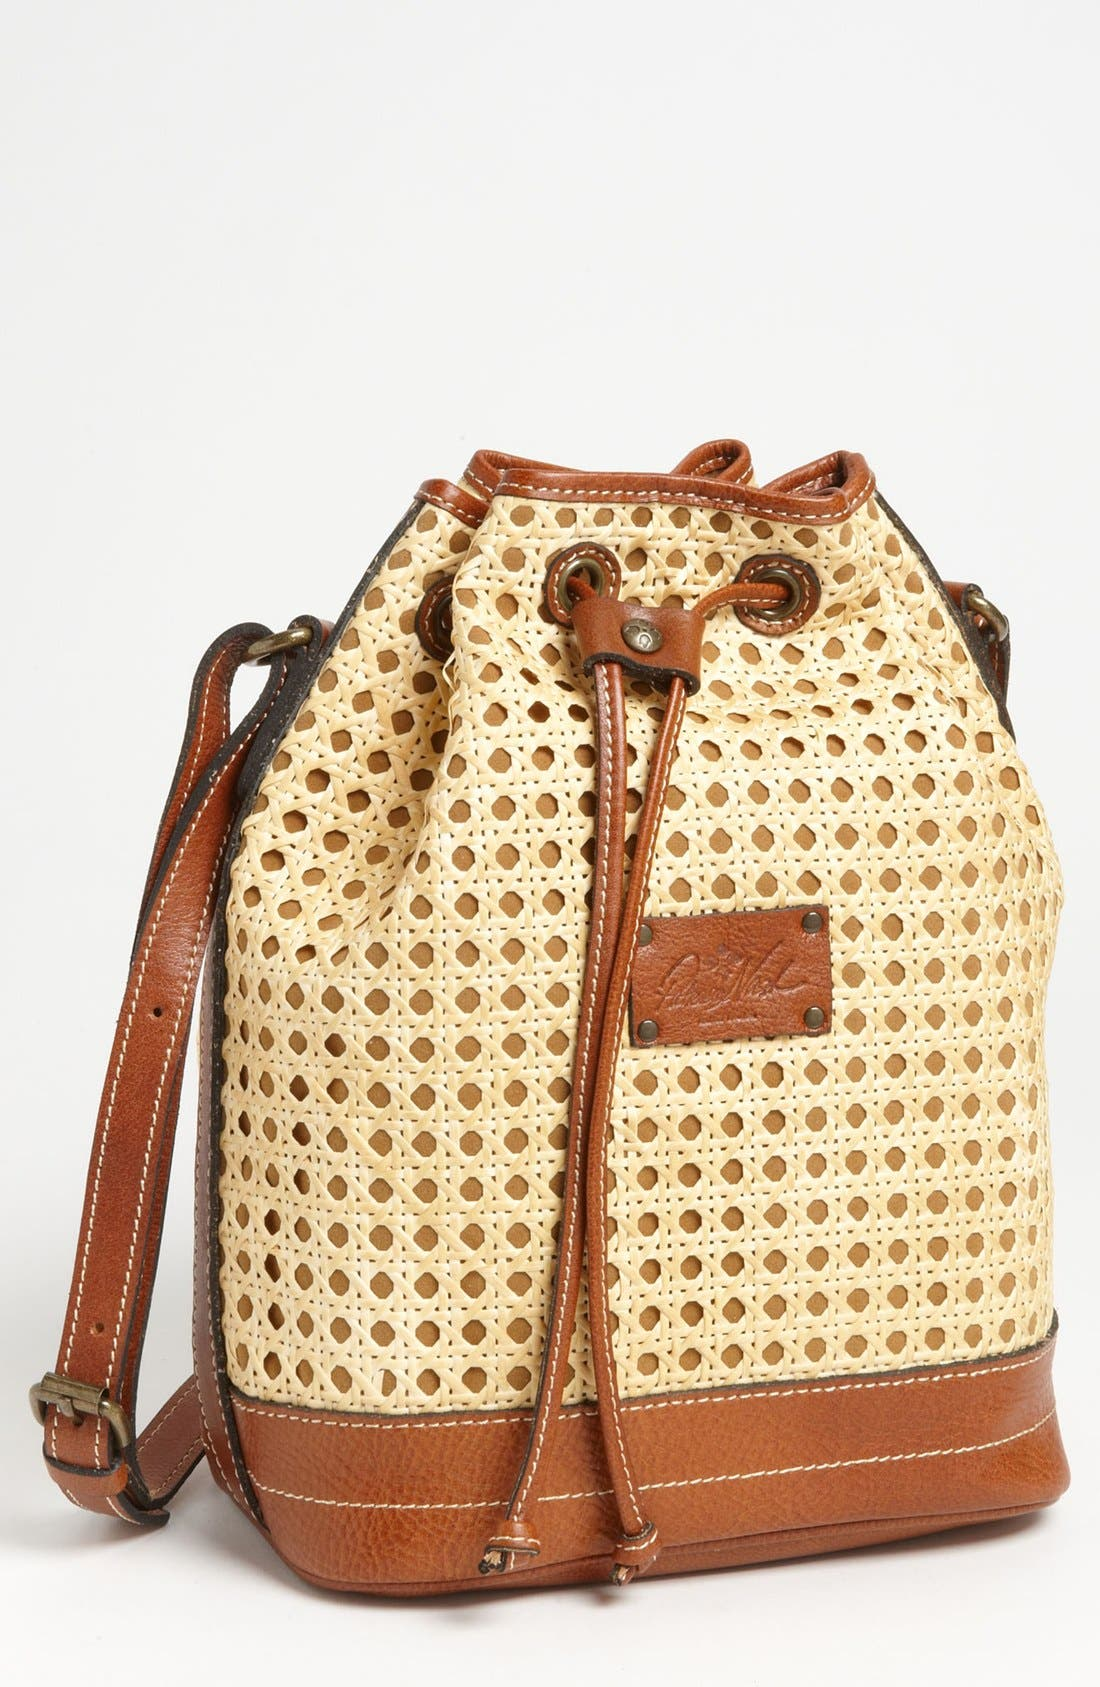 Alternate Image 1 Selected - Patricia Nash 'Comano' Drawstring Shoulder Bag